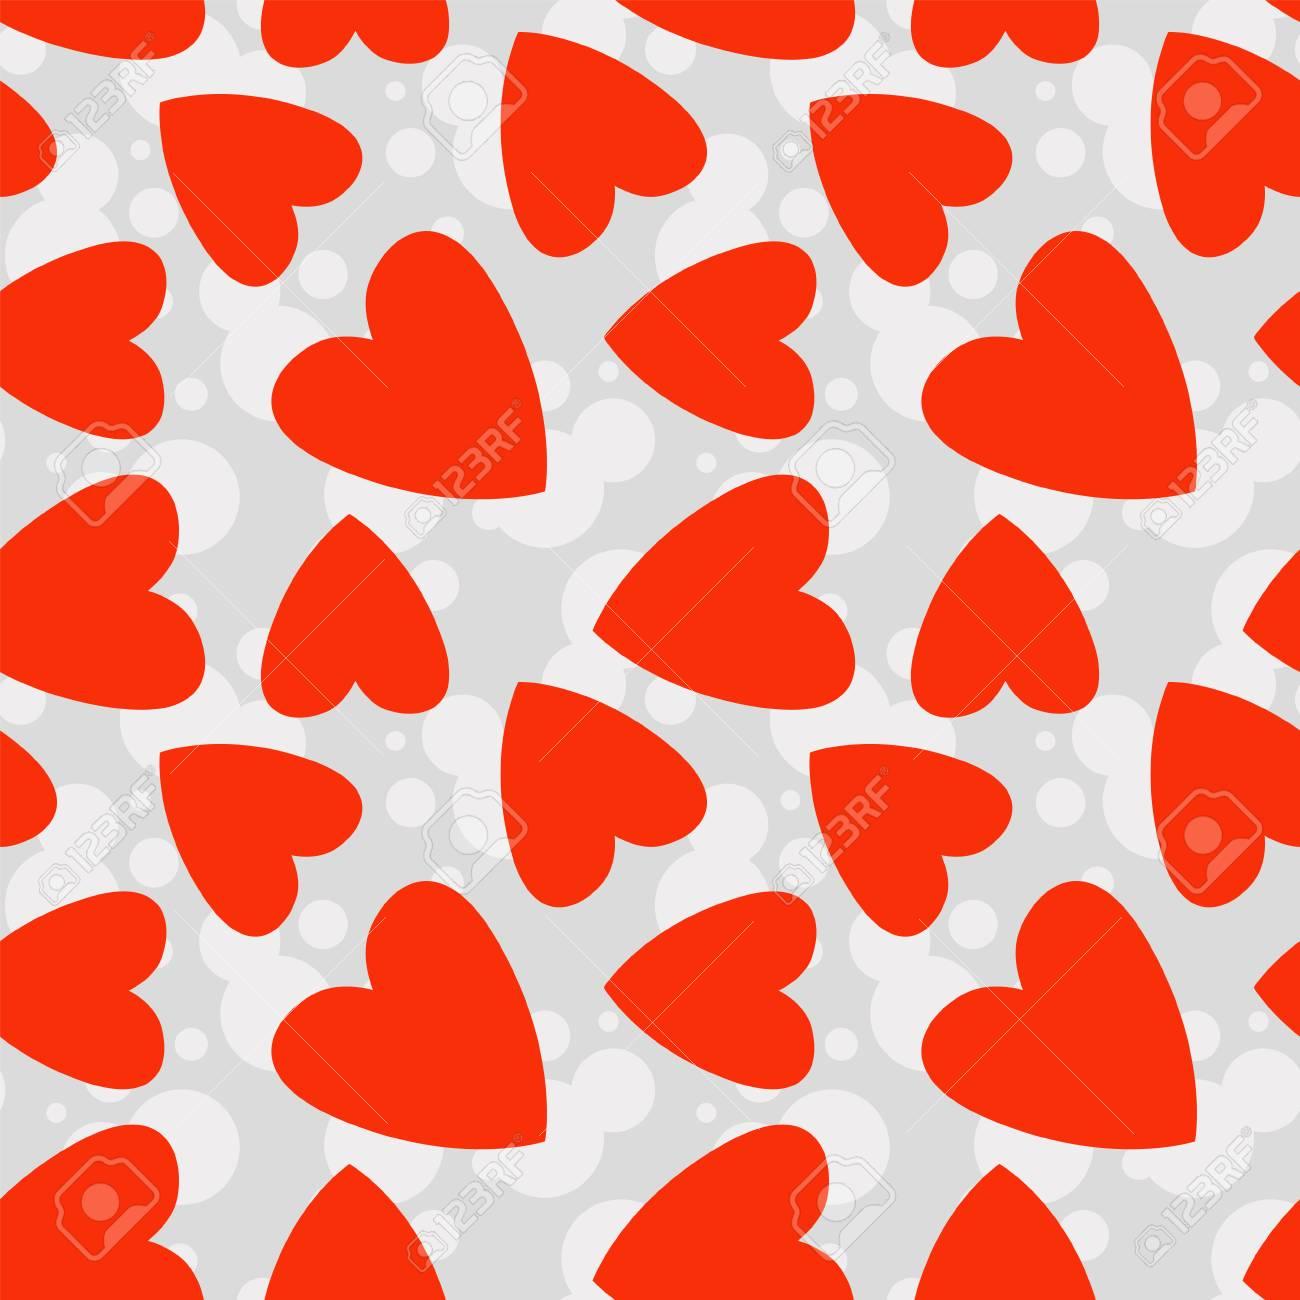 Seamless Cute Hearts Shape Vector Pattern Wallpaper Background